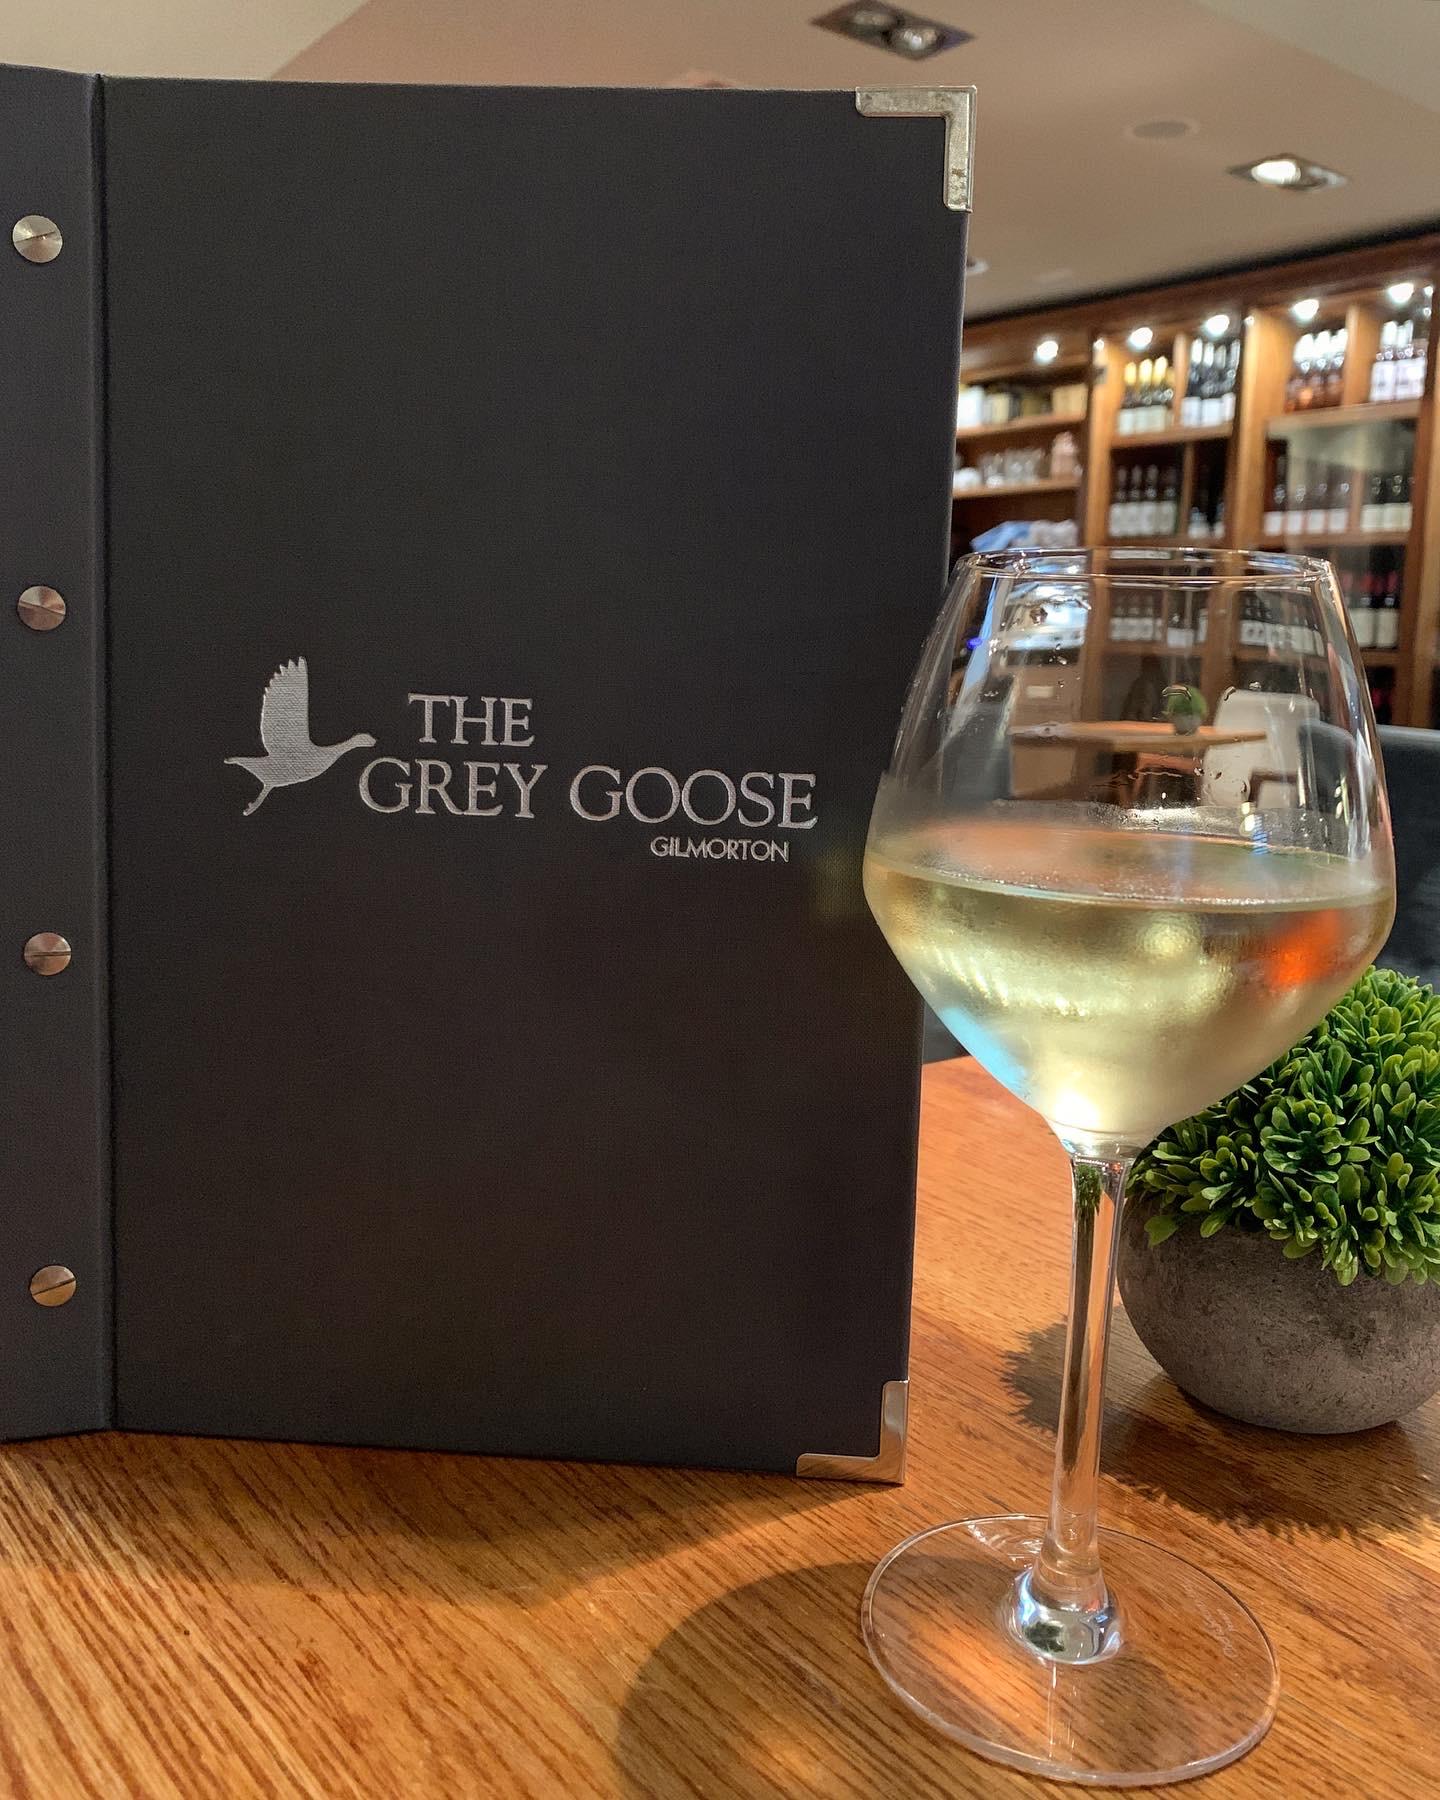 grey goose gilmorton